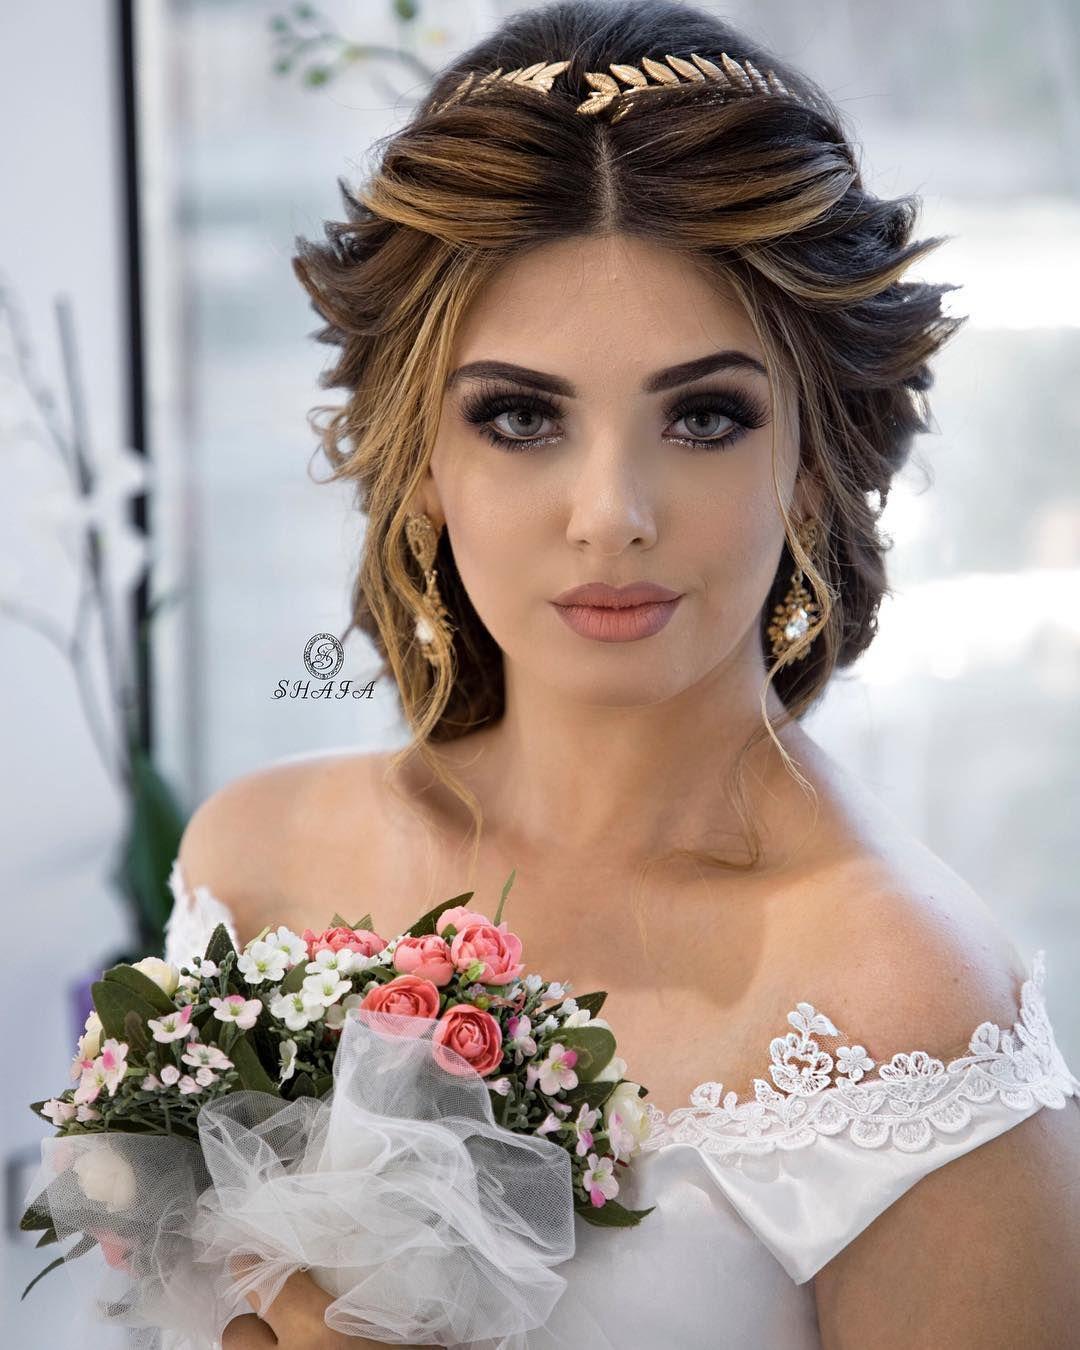 11 4b Begenme 55 Yorum Instagram 39 Da Shafaq Novruzova Shafastudio Quot Makiyaj Ayan Ayan Bridal Hair And Makeup Bride Hairstyles Wedding Hairstyles